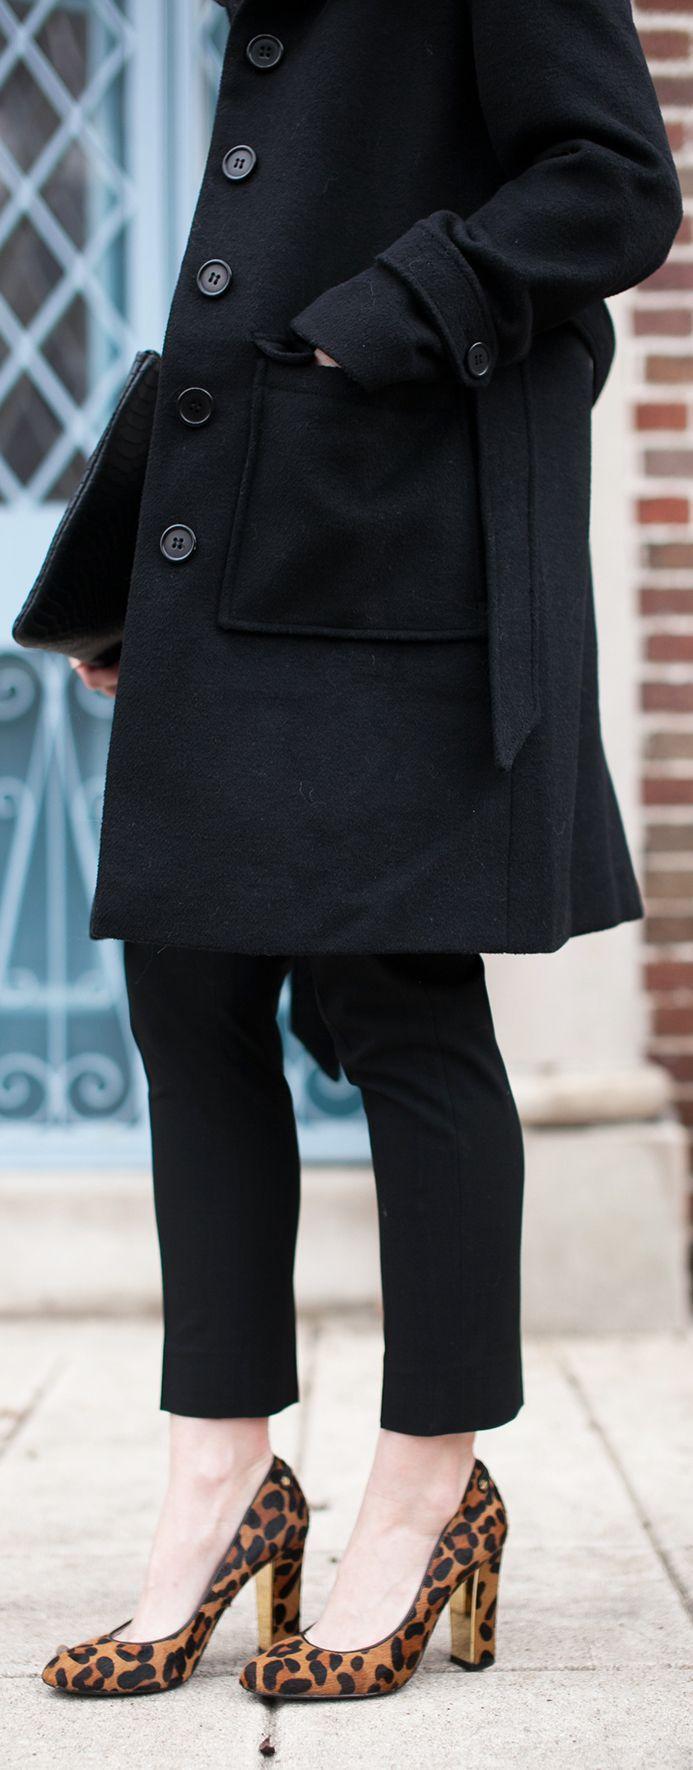 Styling Black & Leopard #NarrativeStyleJournal Nordstrom Leopard Print Heels Gap Jeans, LOFT Coat Narrative Personal Styling | Lana Jackson | DC Stylist | Denim, Denim and Heels, Spring Outfits Winter Outfits Women's Fashion Classy Women's Style Classy Work Outfits Fashion Blog #SpringOutfits #Denim #SpringOutfits #WinterOutfits#WomensFashion #WomensStyle #Leopard #LeopardPrint #springstyle #NarrativeStyling #WorkOutfits